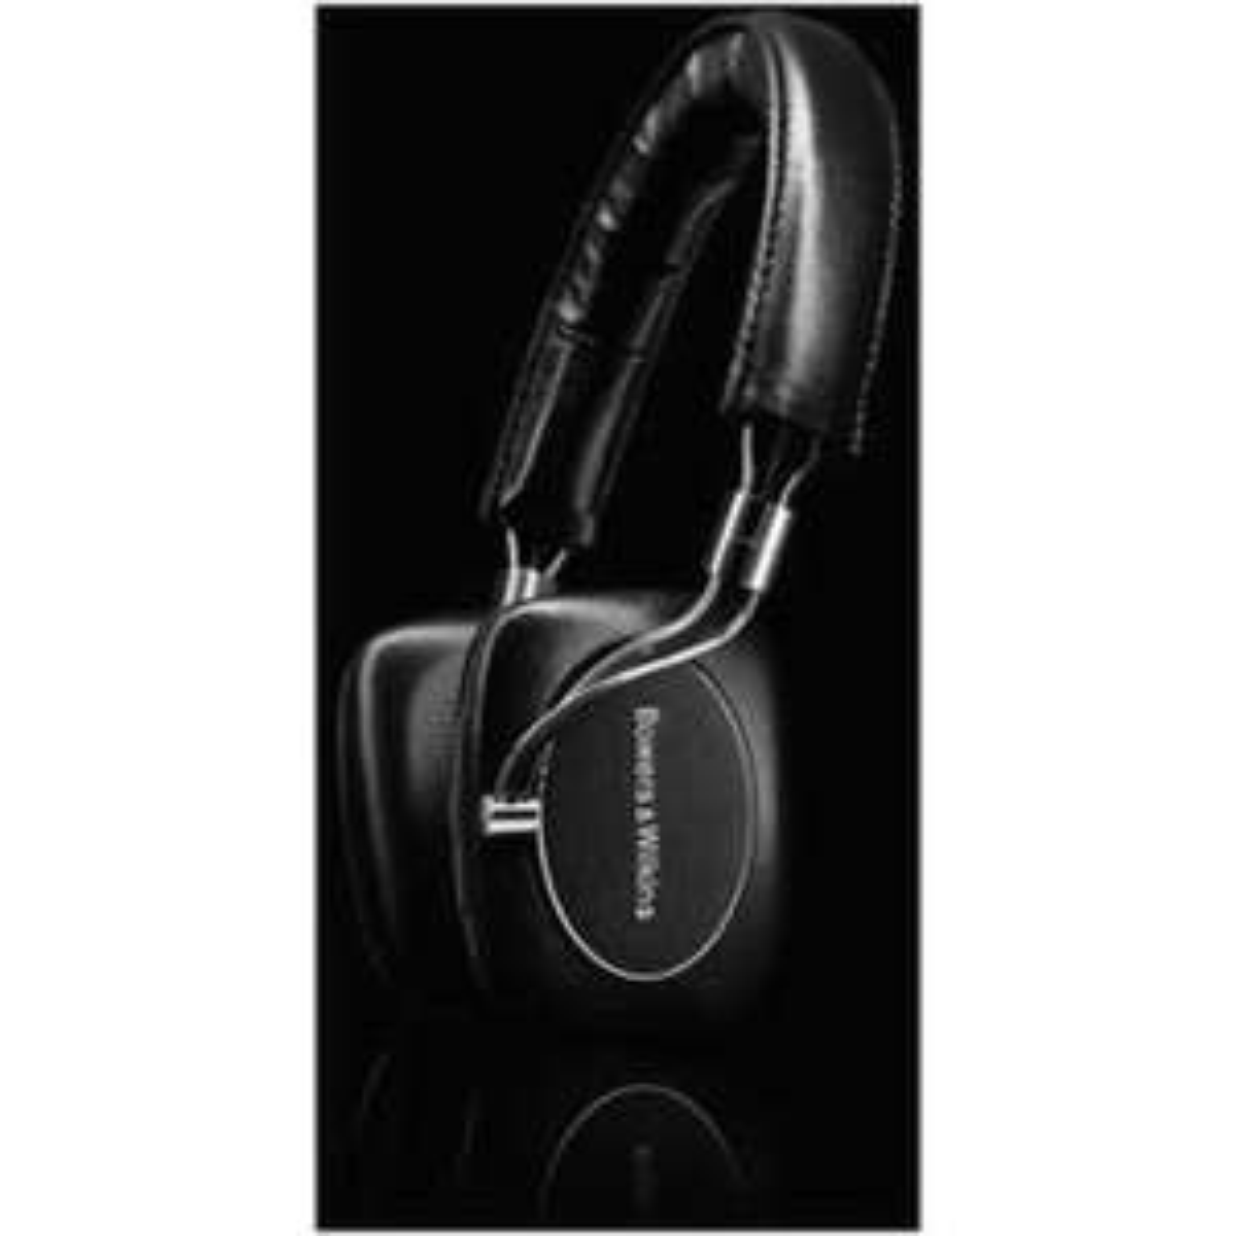 Bowers & Wilkins P5 Wireless Kopfhörer inkl. Versand @ Euronics